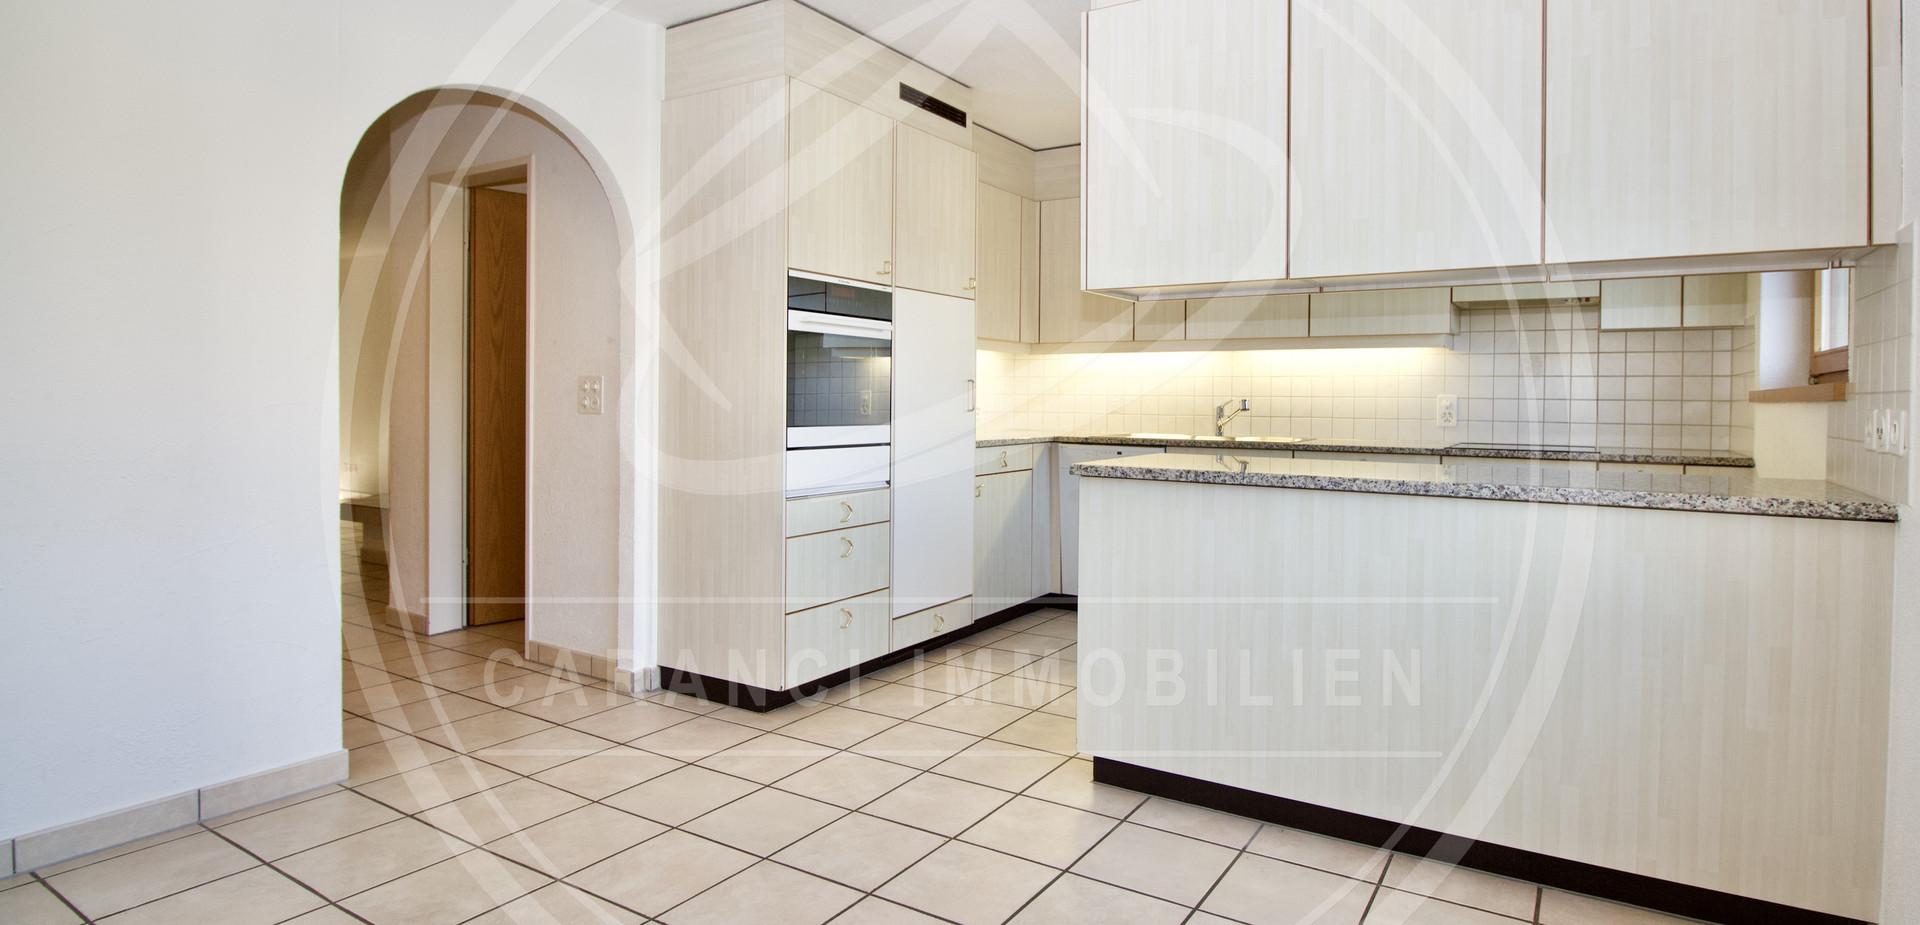 Caranci Immobilien - Tägerig Parterrewohnung